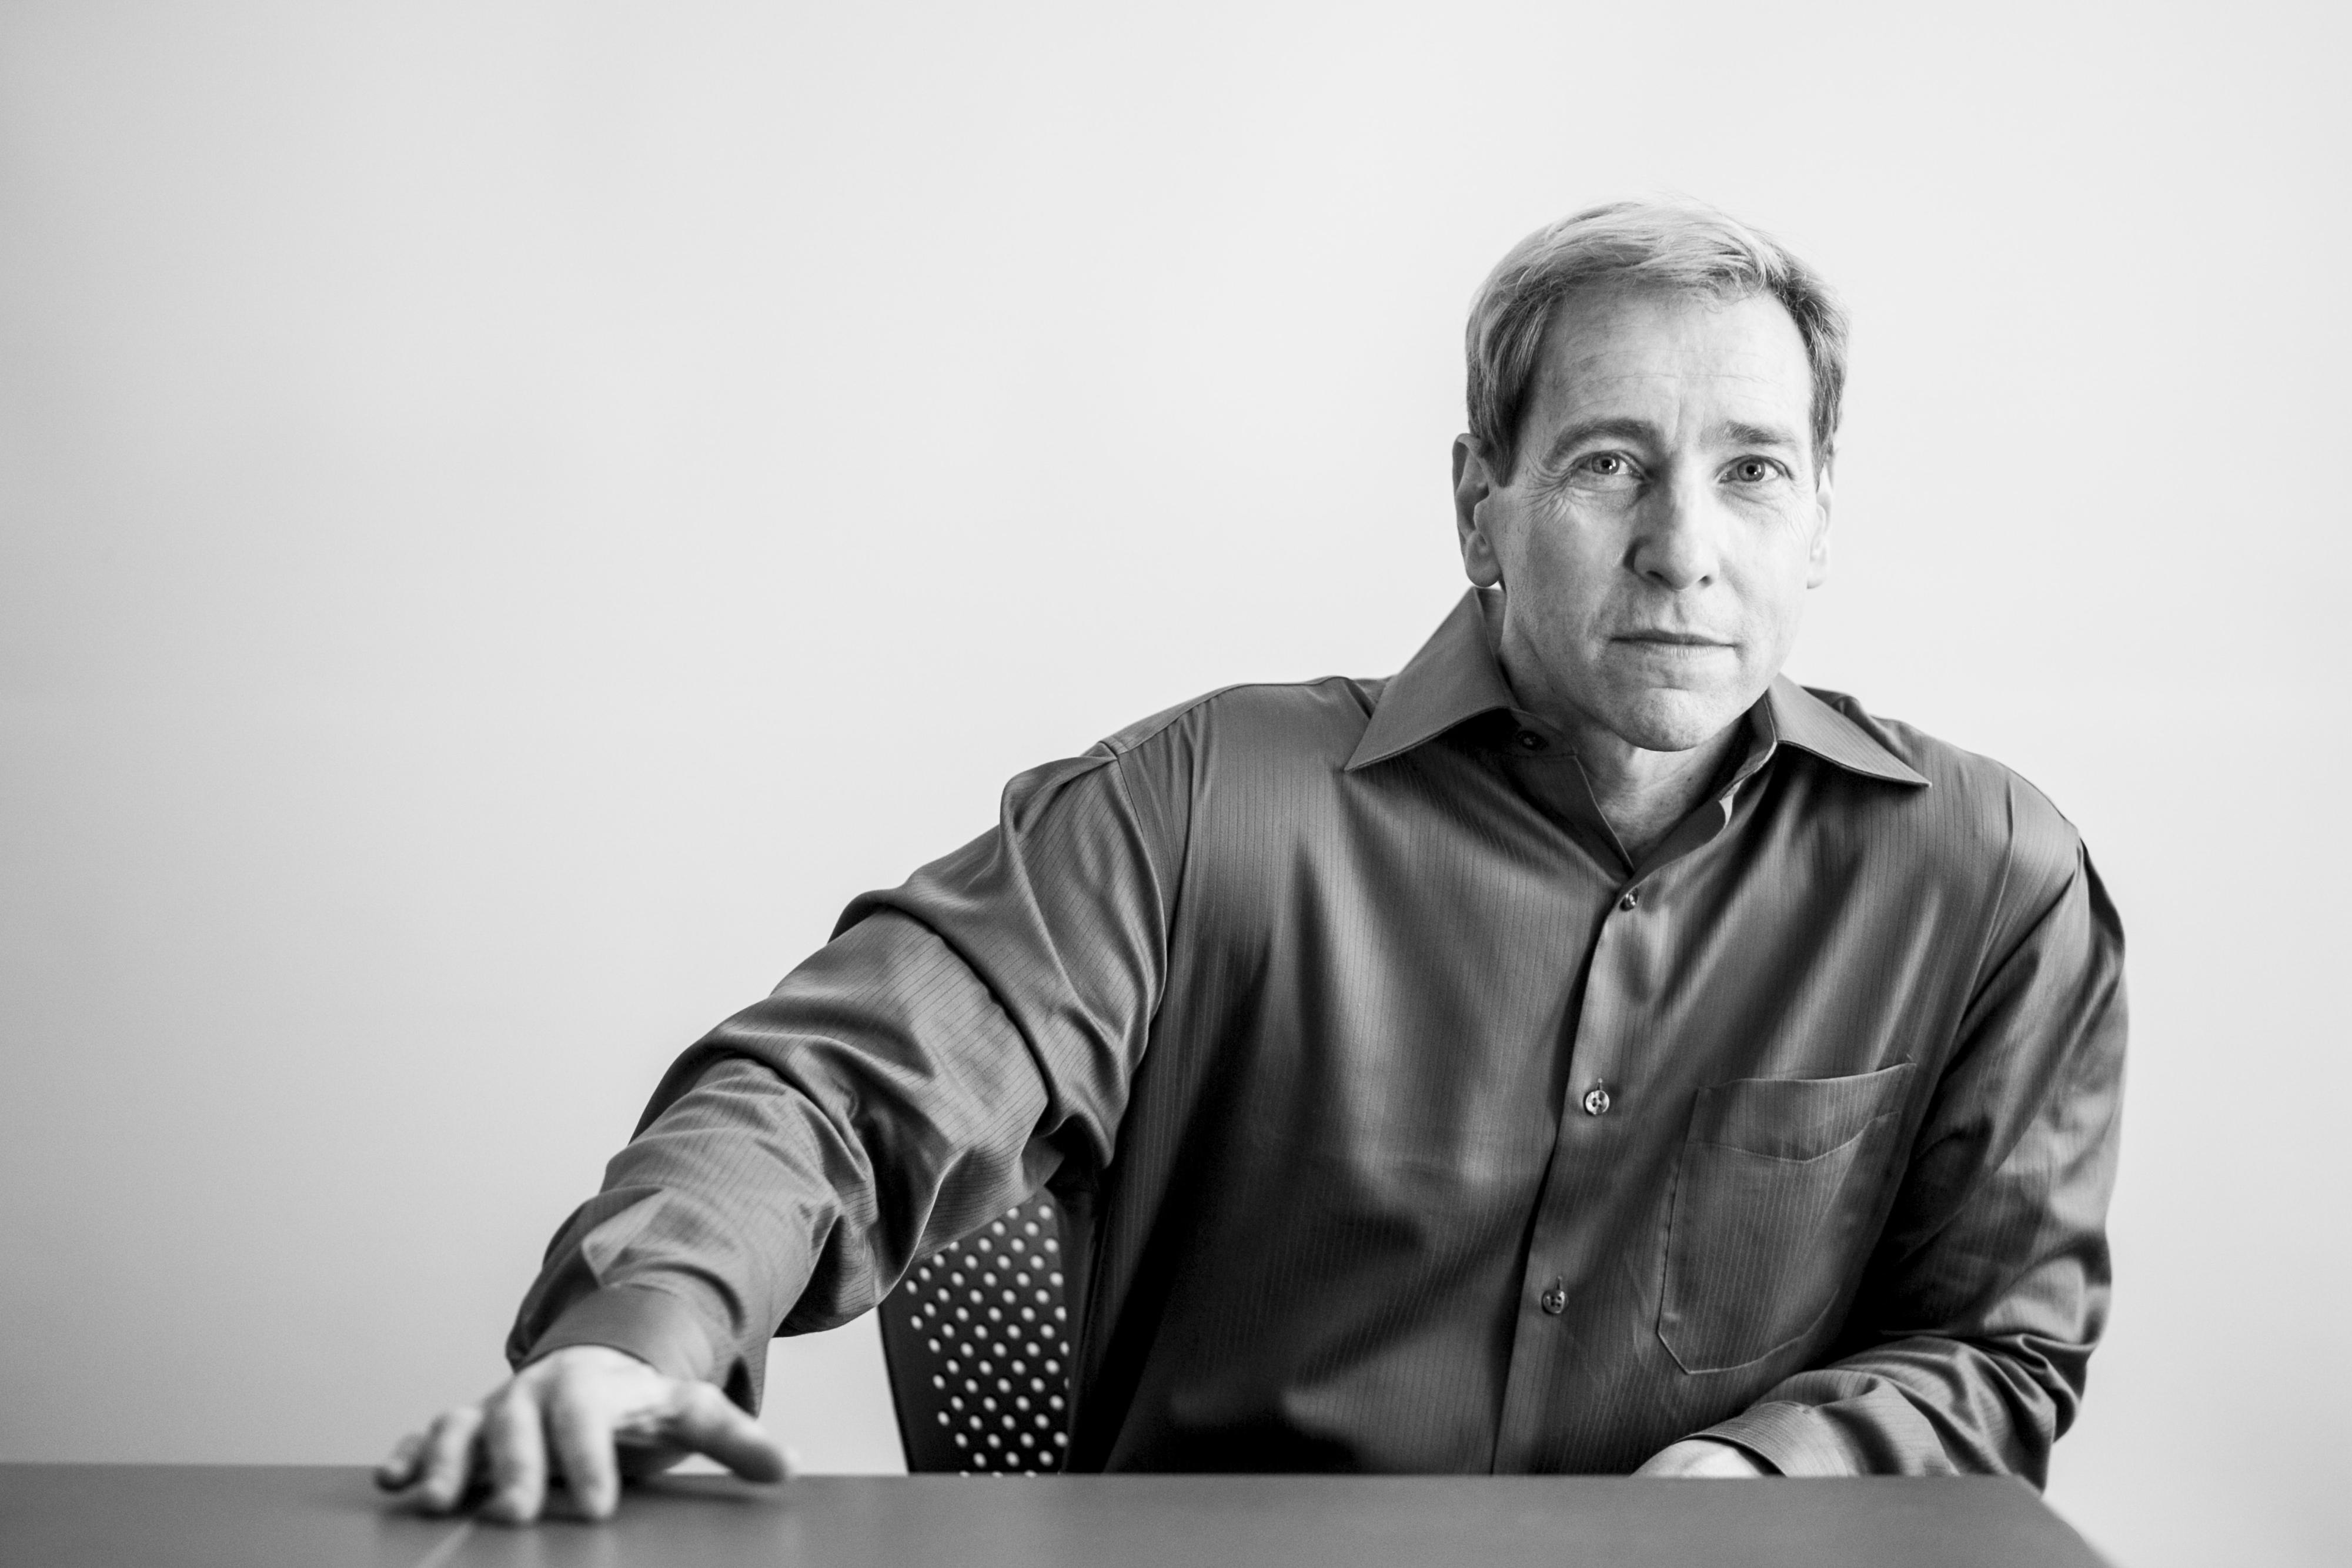 Lee Edelman